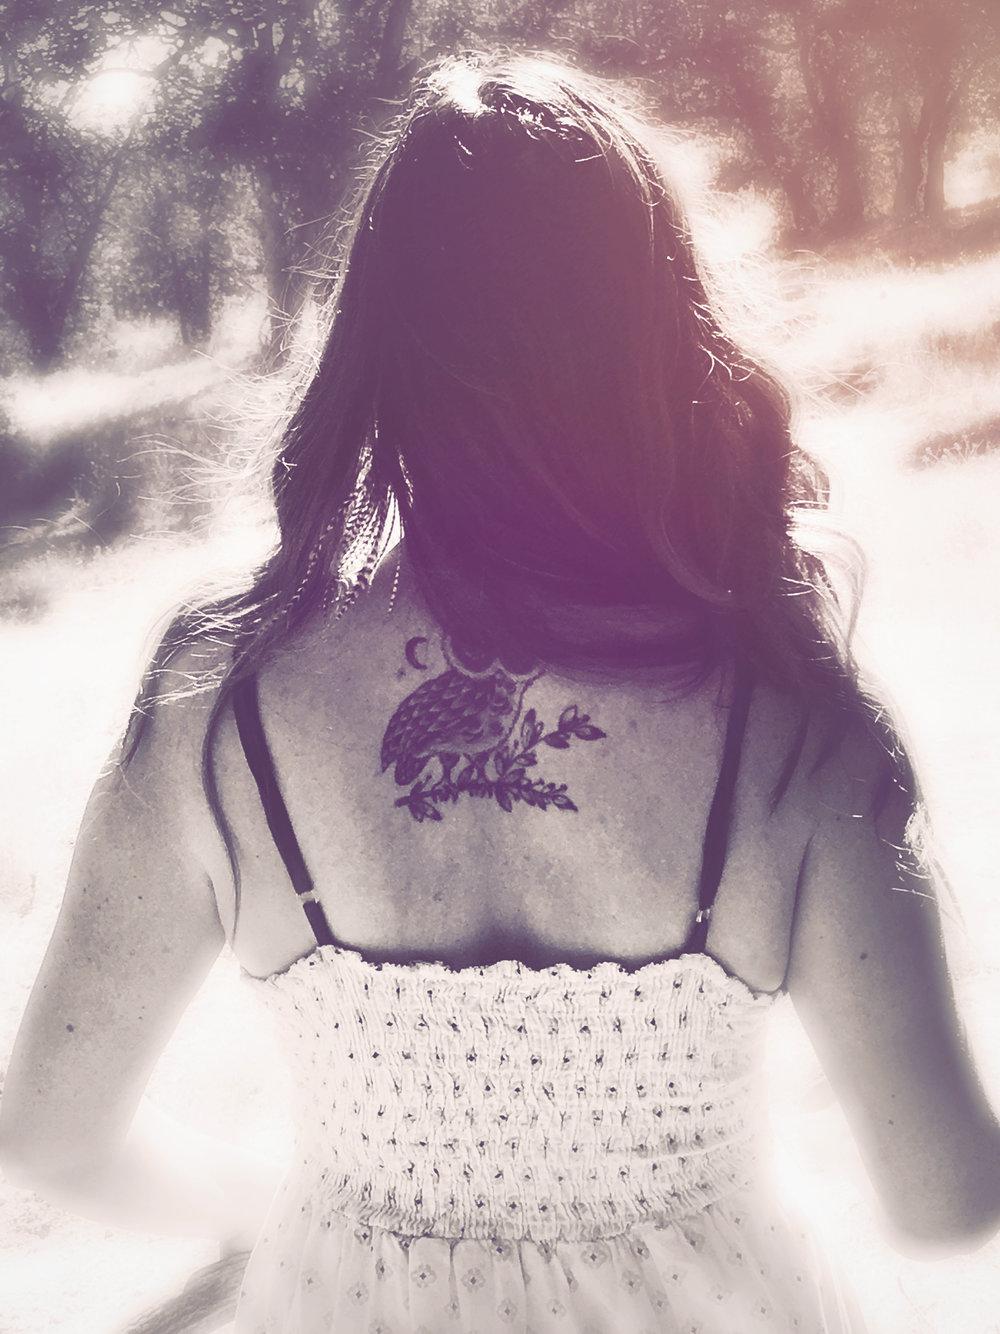 Sarah La Rosa, author of Her Strange Angels. SarahLaRosa.com